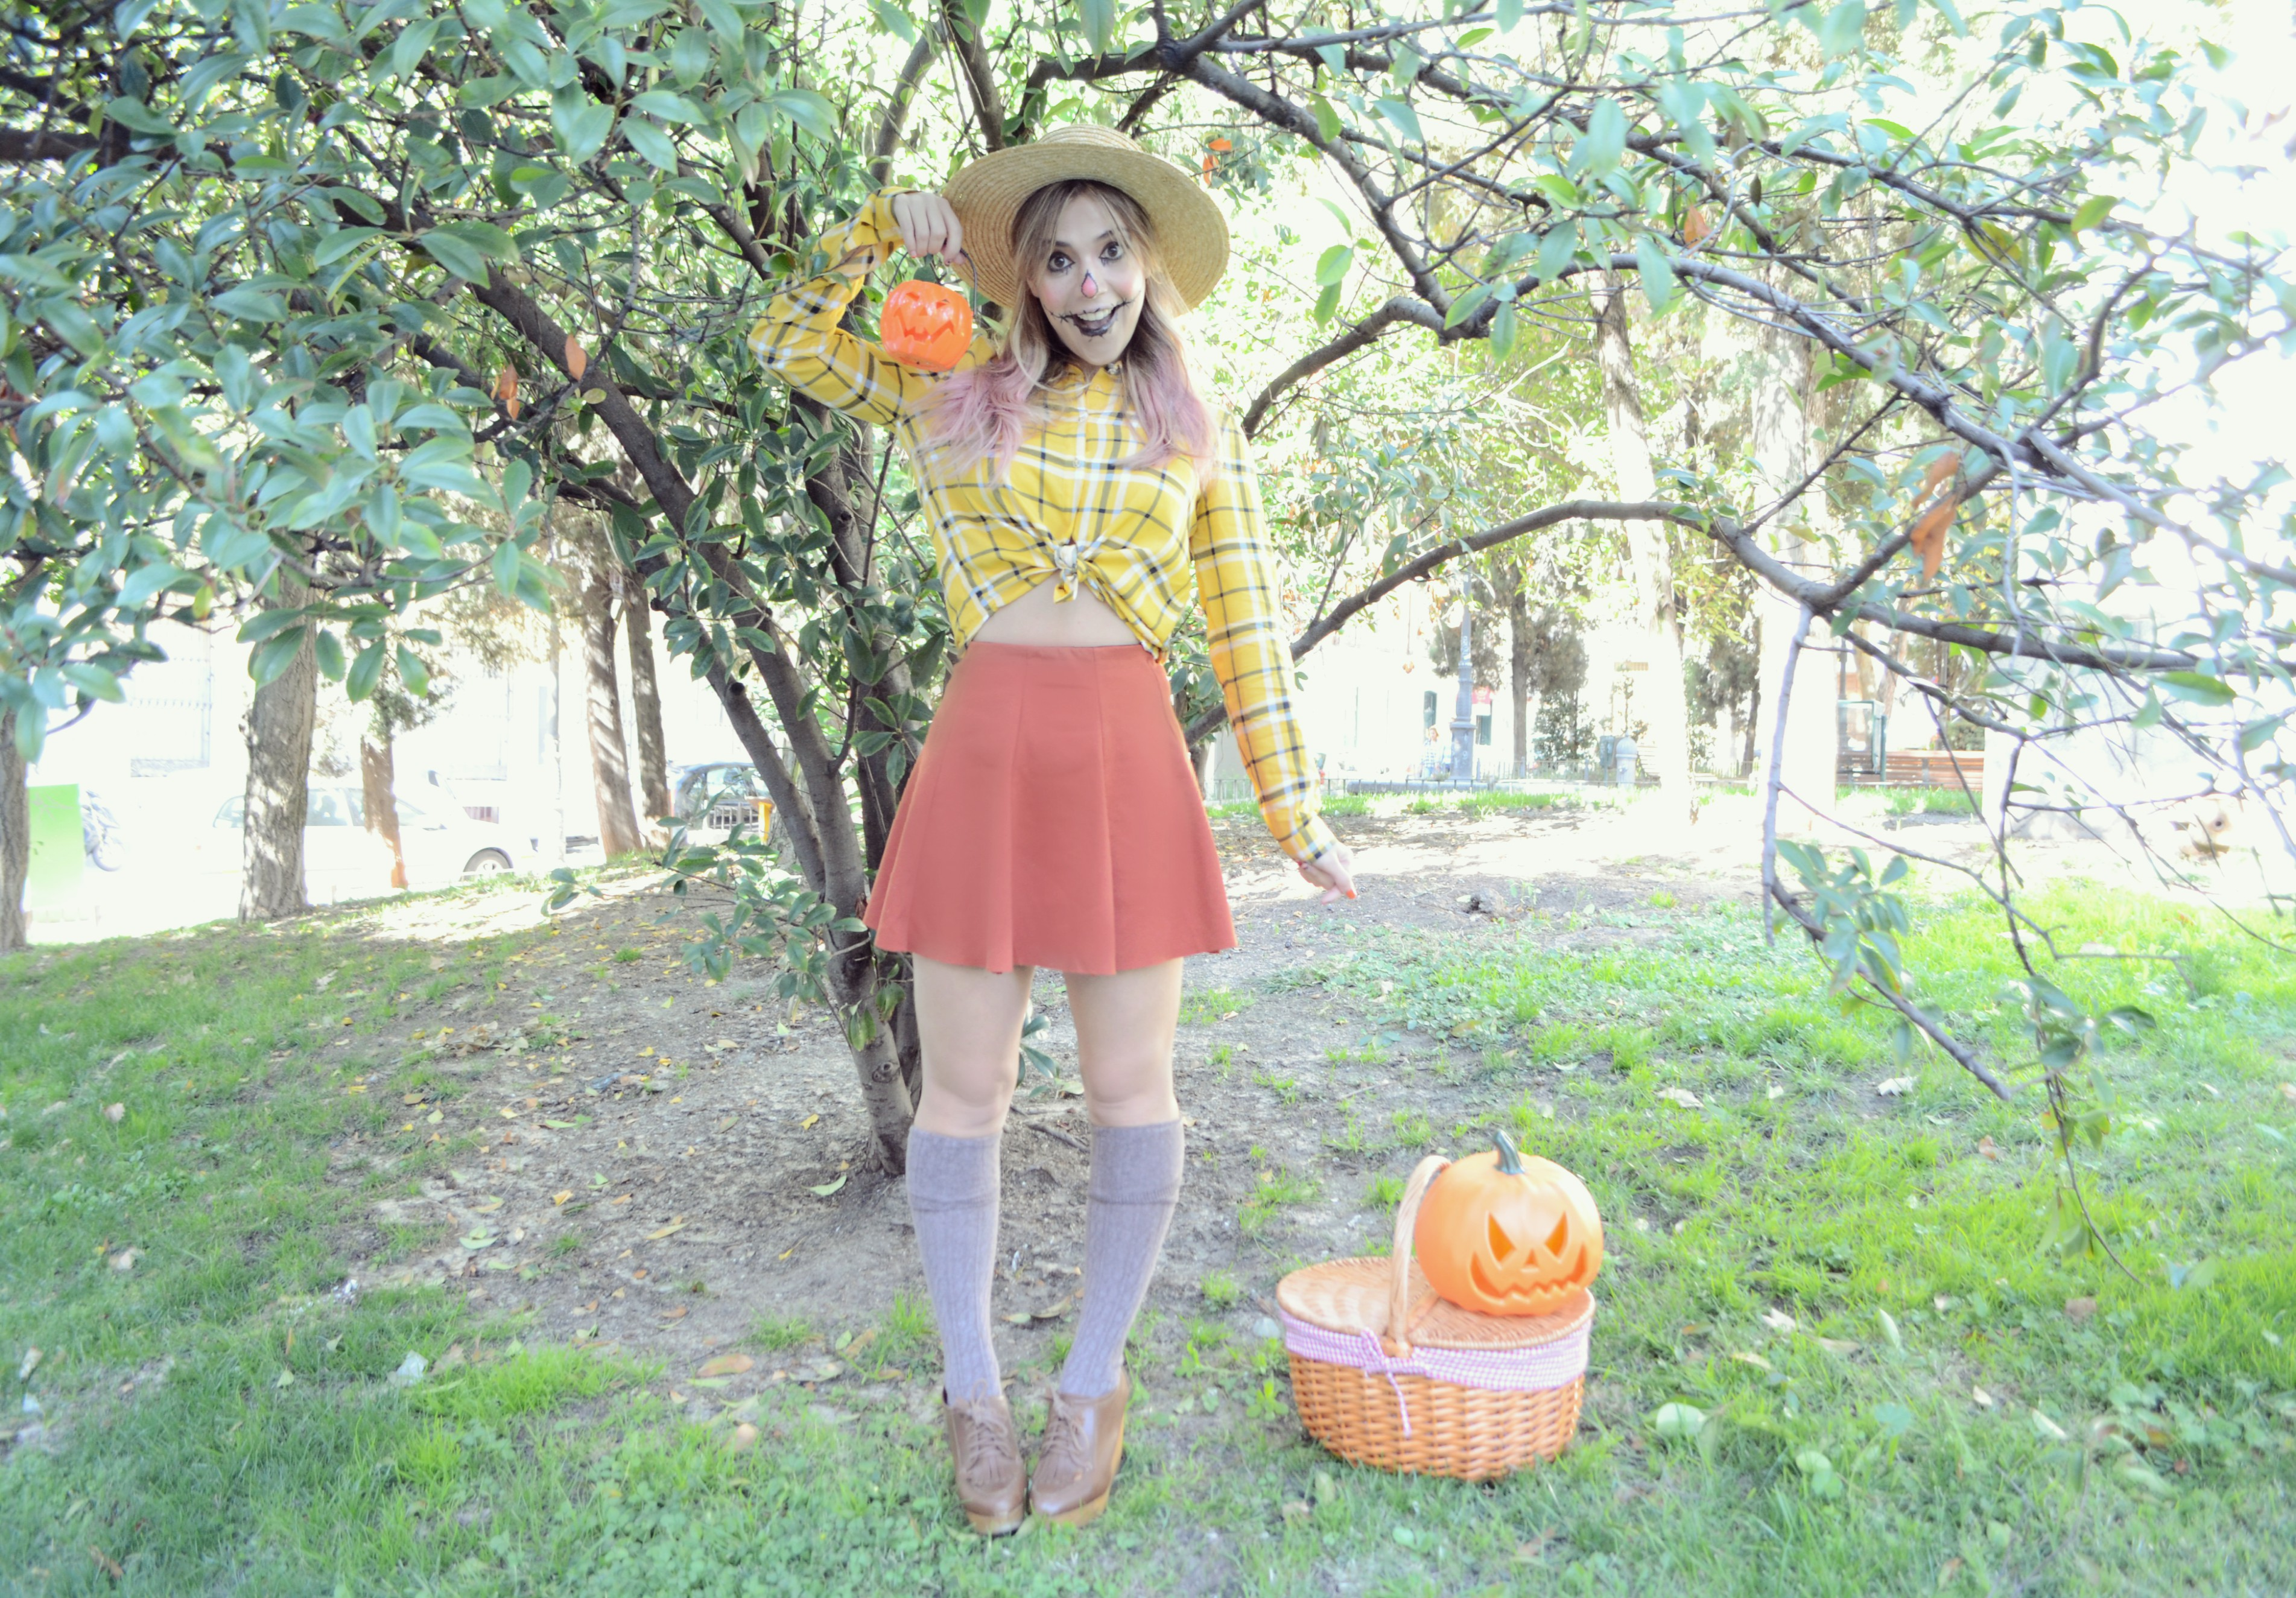 scarecrow-makeup-halloween-costume-ChicAdicta-influencer-Chic-Adicta-blog-de-moda-fashionista-urvan-beauty-on-the-go-Madrid-PiensaenChic-Piensa-en-Chic